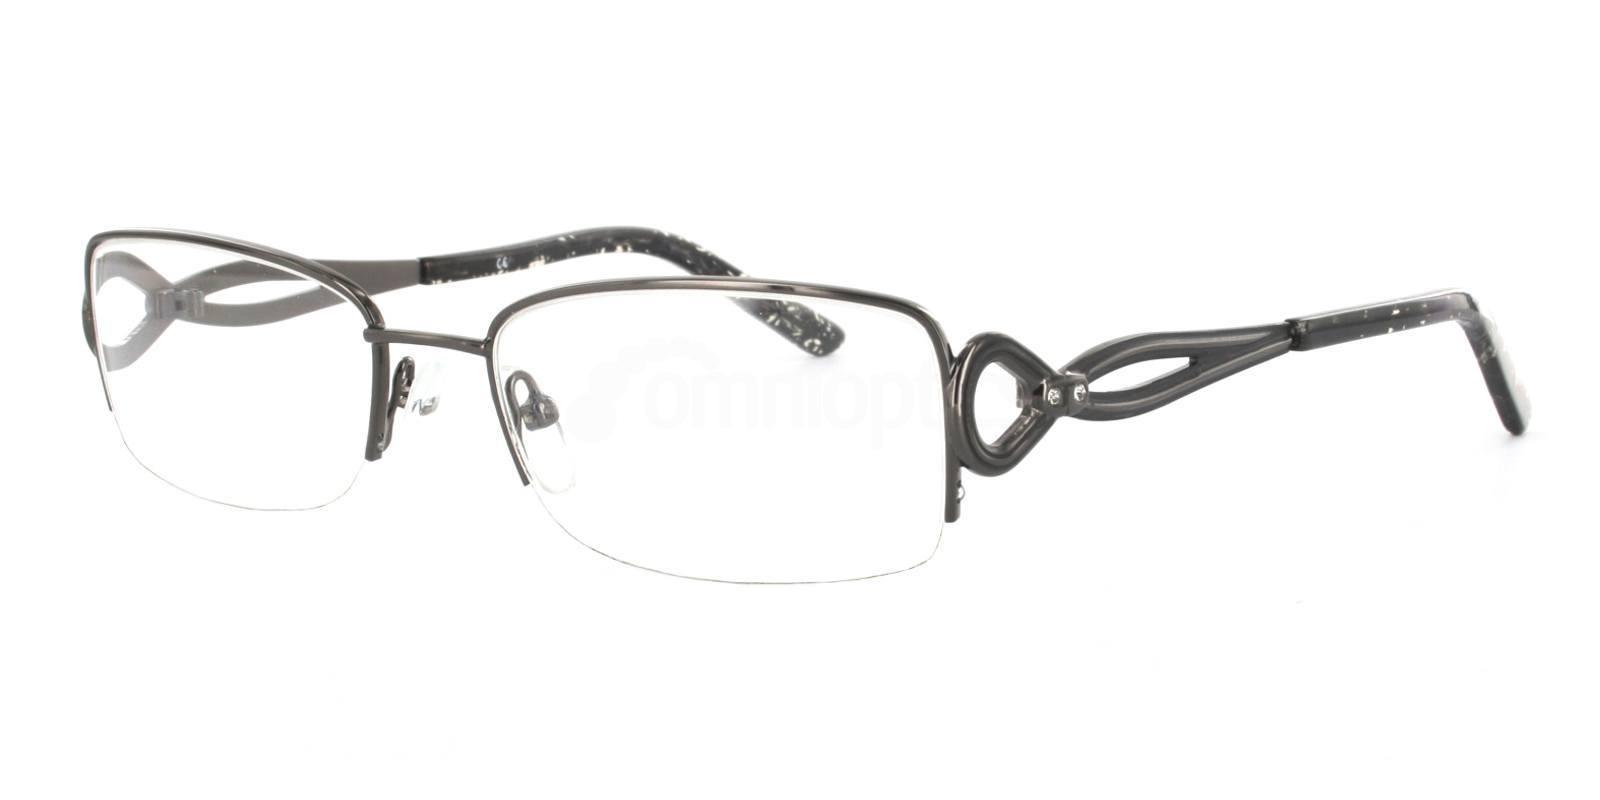 C2 Y25948 Glasses, SelectSpecs